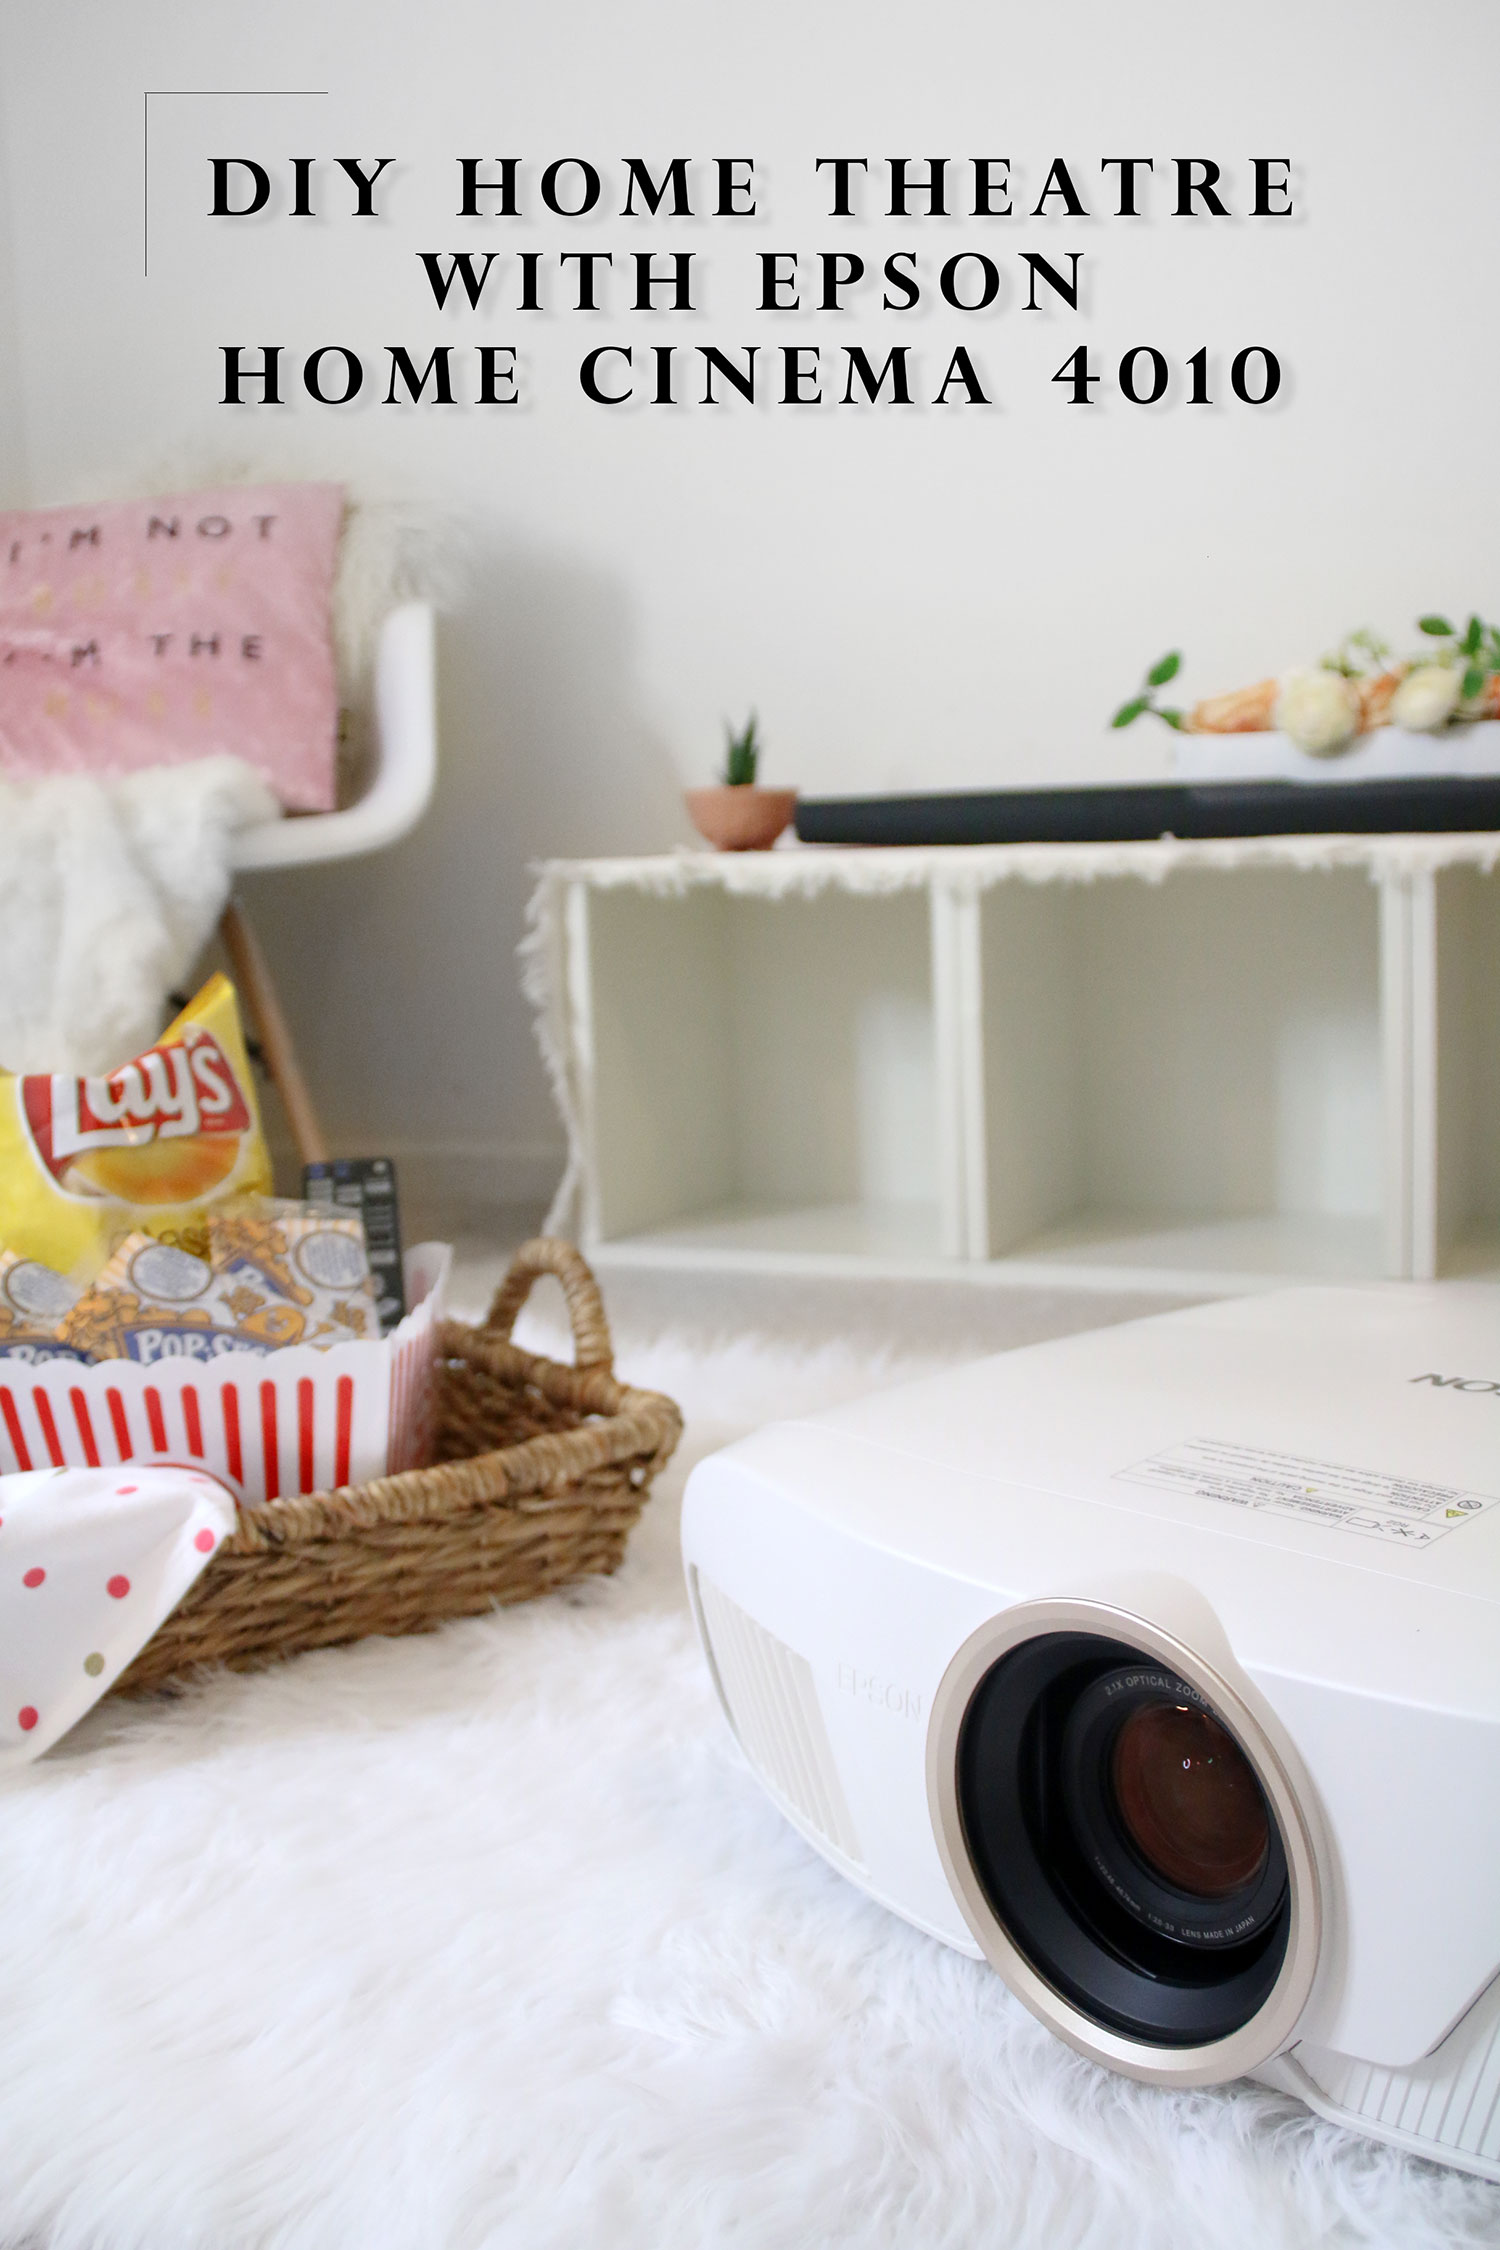 Epson Home Cinema 4010